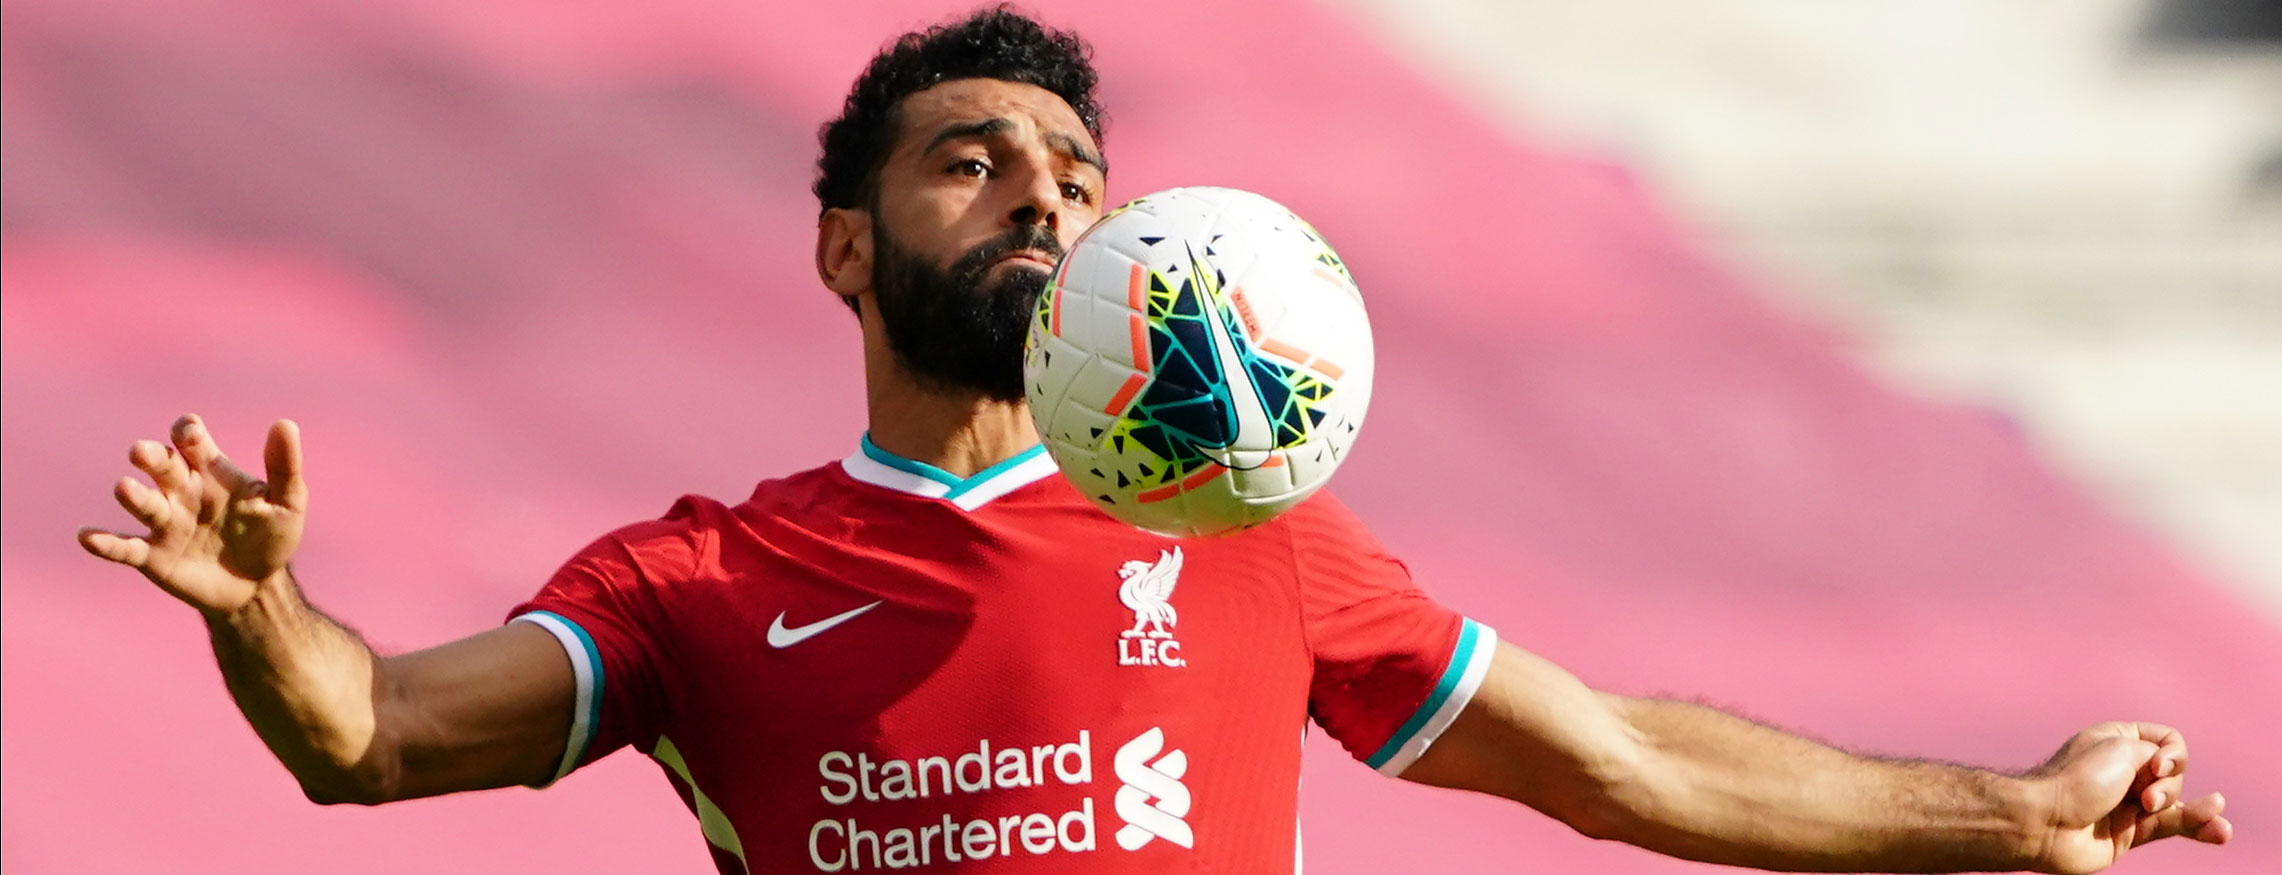 Liverpool stars Sadio Mane, Mohamed Salah and Roberto Firmino